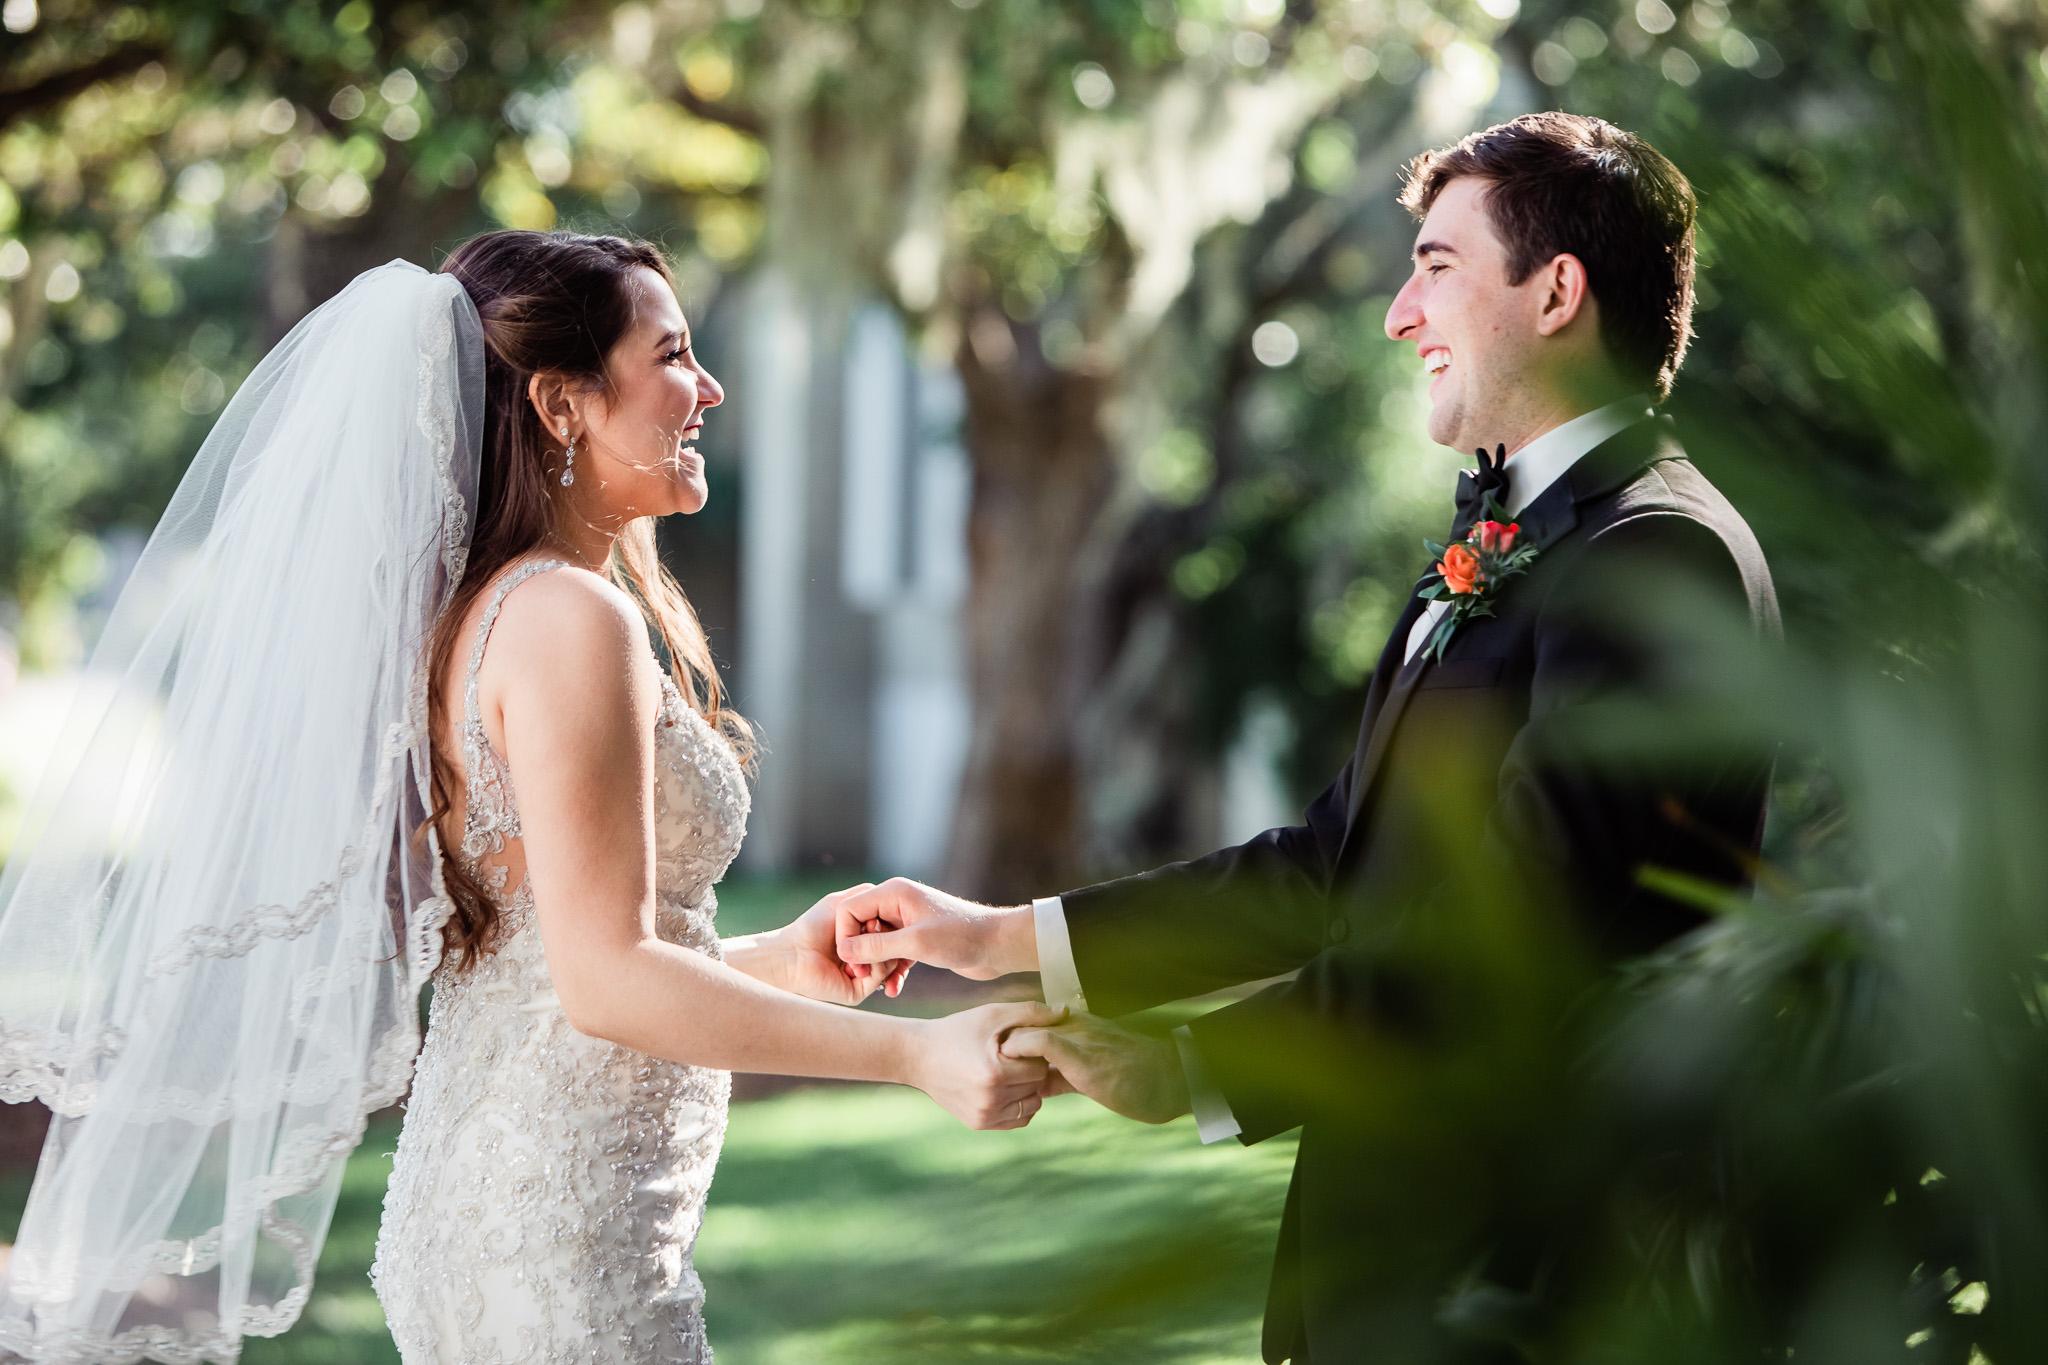 TAMPA_WEDDING_PHOTOGRAPHER_MPMZ_TJL47181_0058.jpg